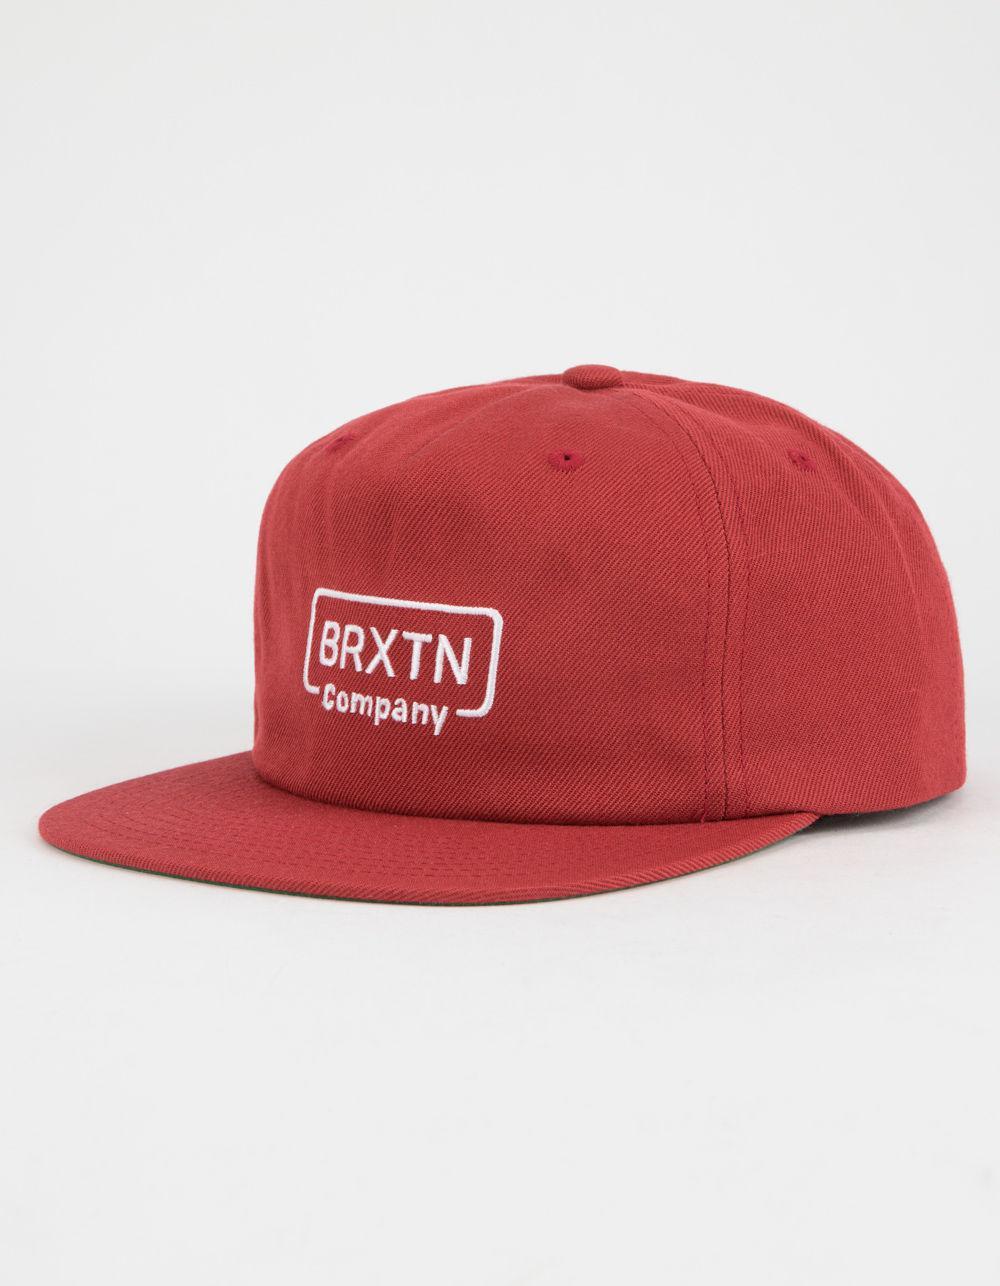 6c92b1701d7 Lyst - Brixton Crosswhite Mens Snapback Hat in Red for Men